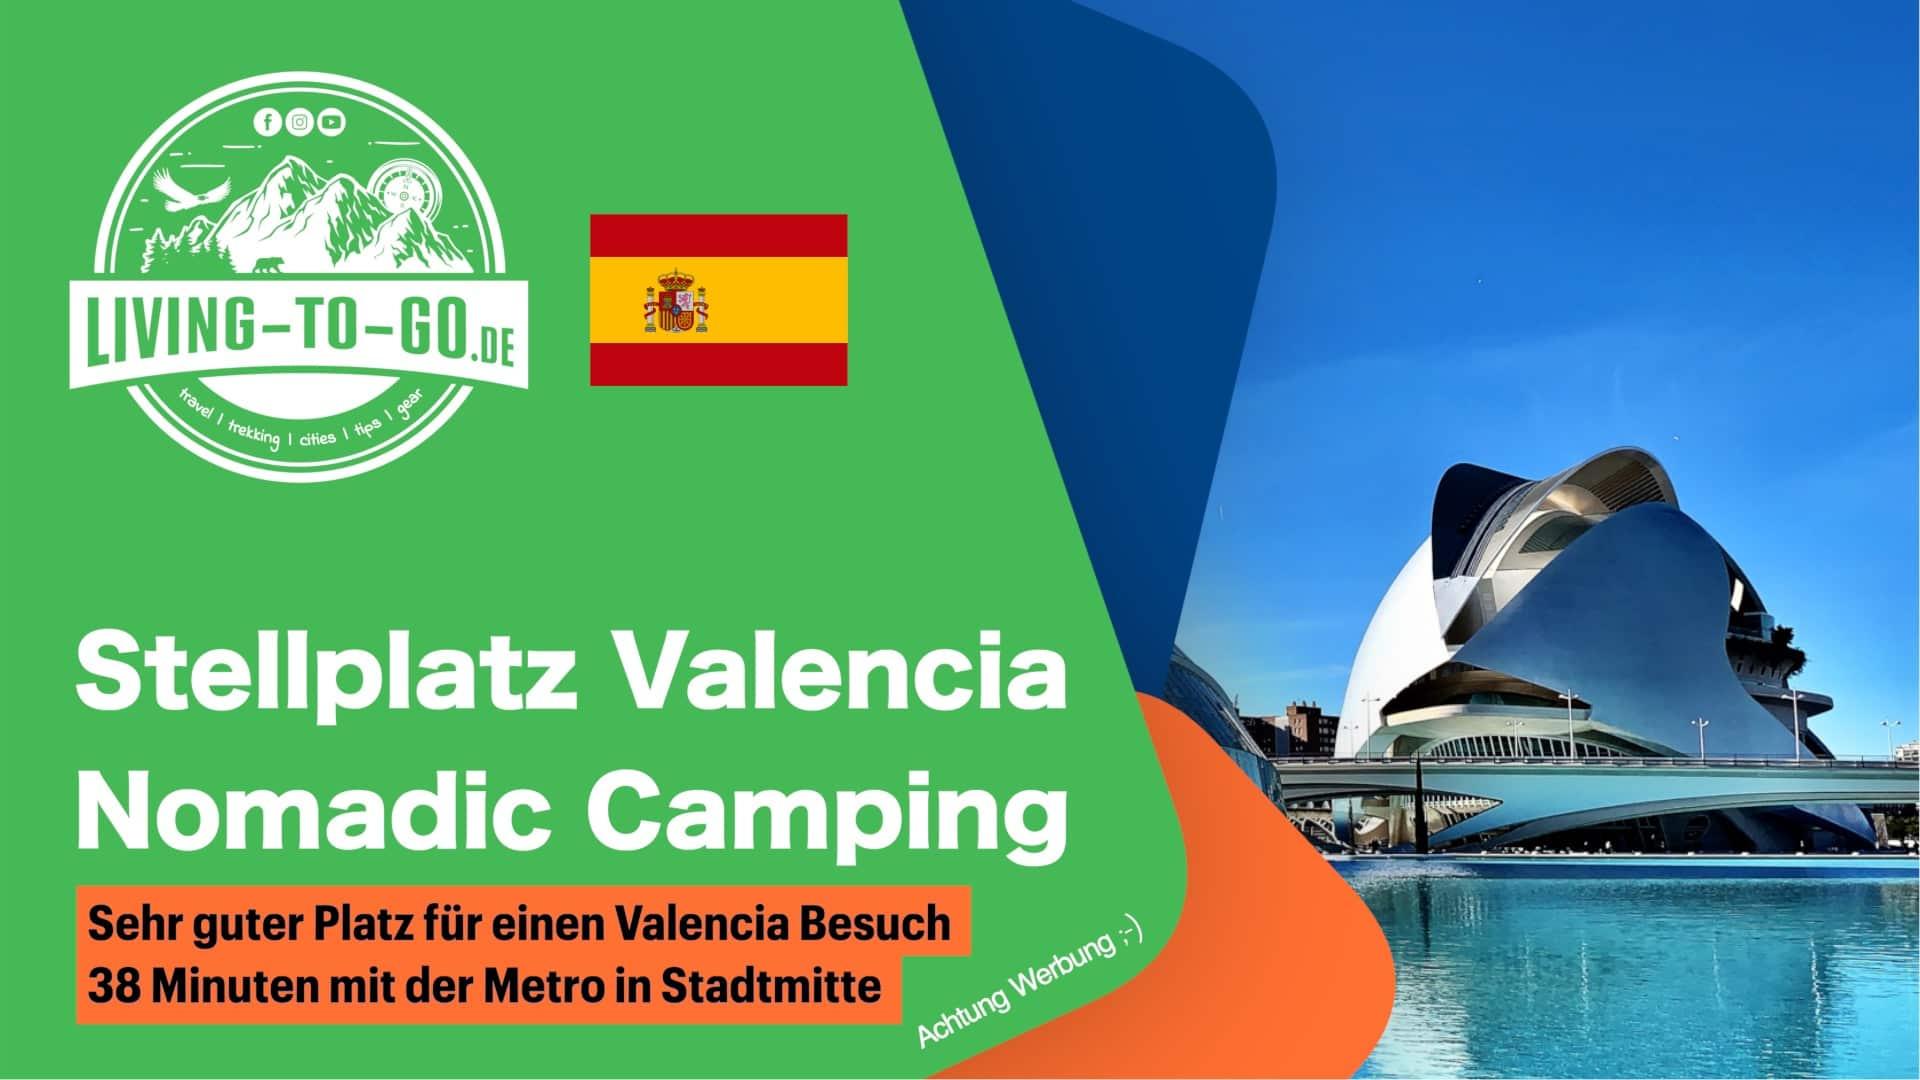 Stellplatz Valenci Nomadic Camping Car Spanien